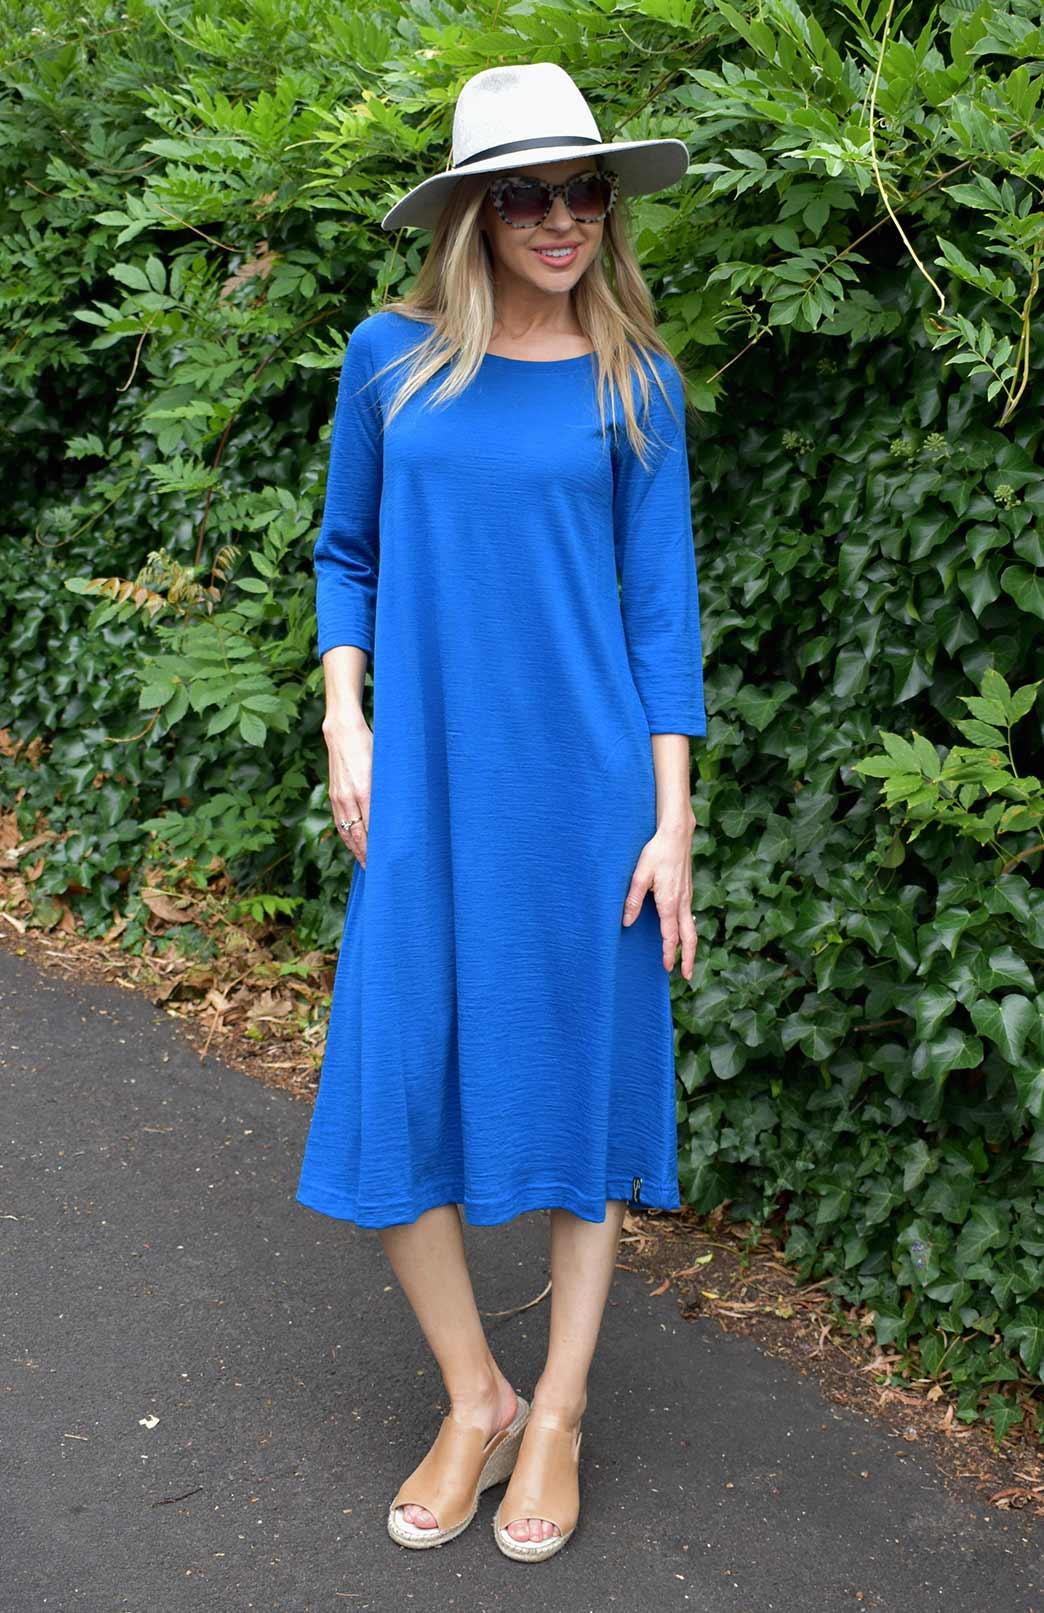 Kelly Dress - Women's Royal Blue Pure Merino Wool A-Line Dress with 3/4 Sleeves and Side Pockets - Smitten Merino Tasmania Australia